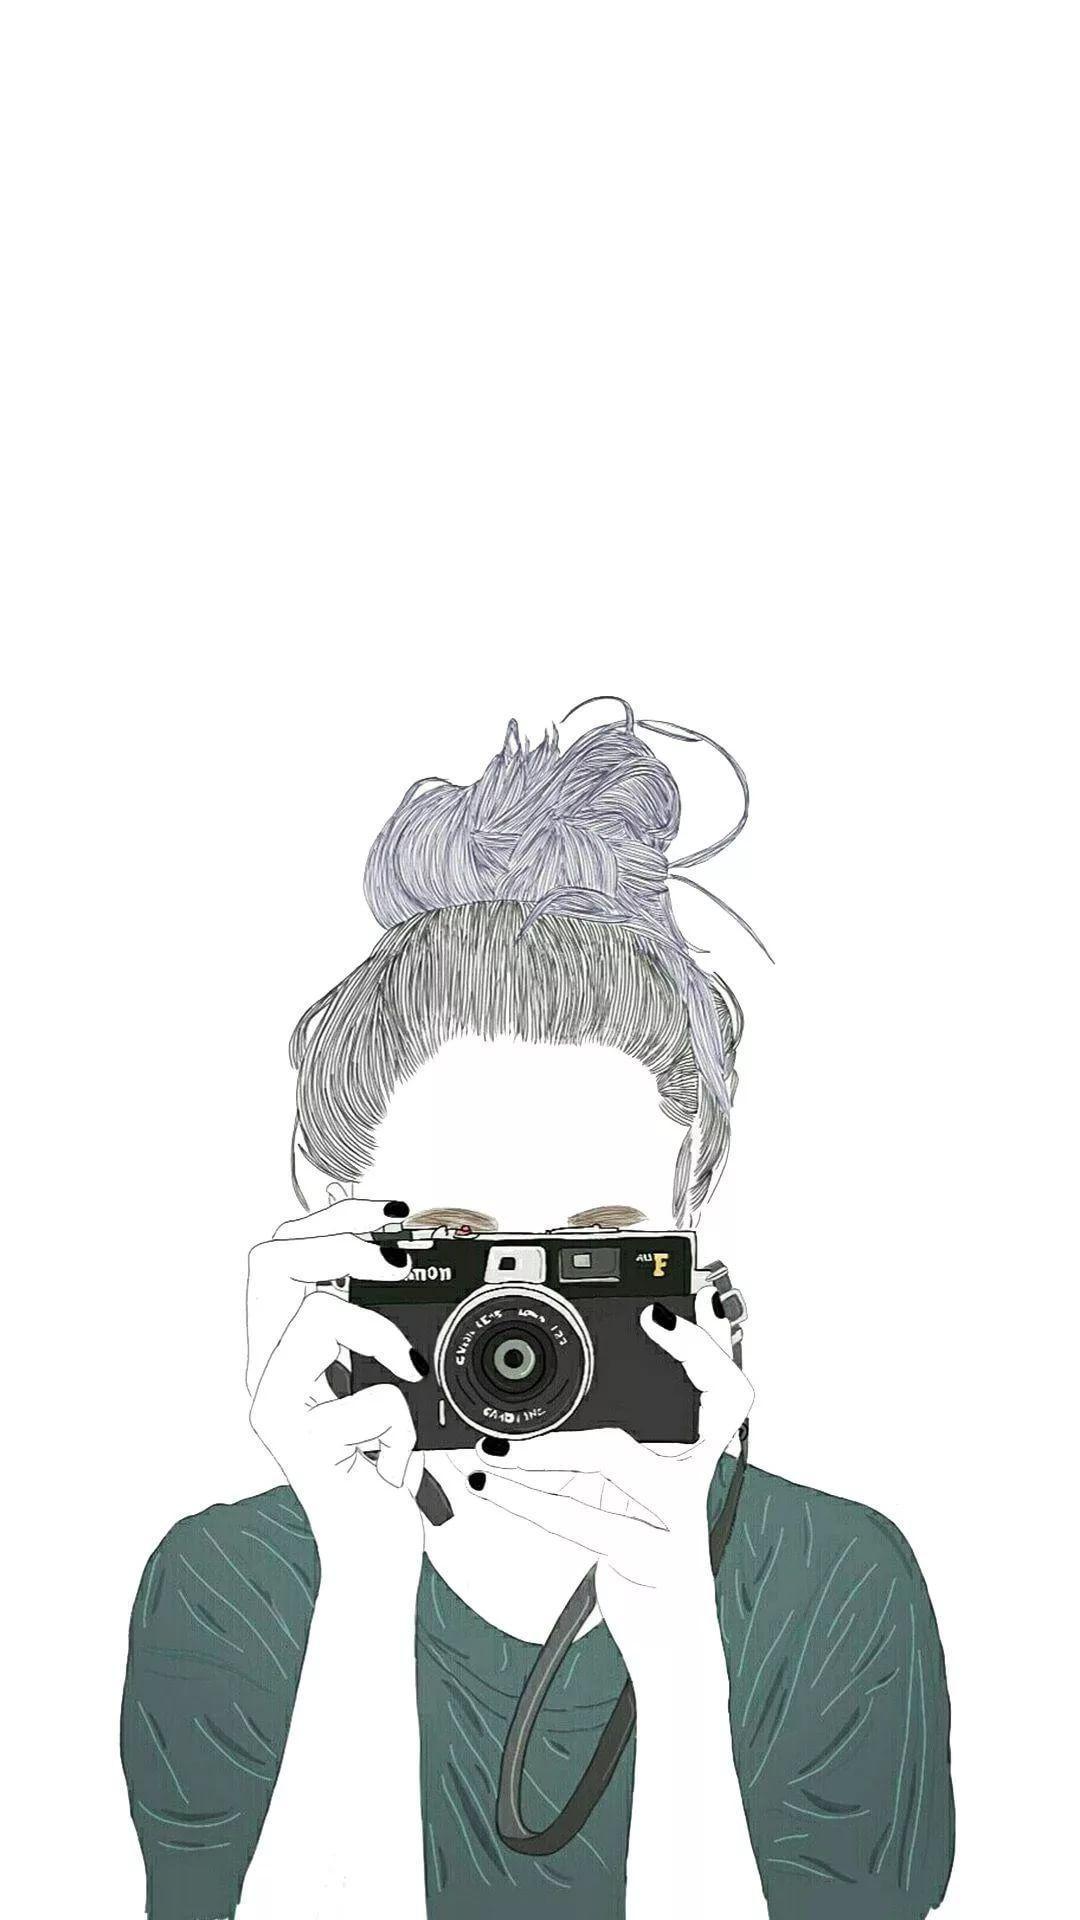 Girl Tumblr Wallpapers Top Free Girl Tumblr Backgrounds